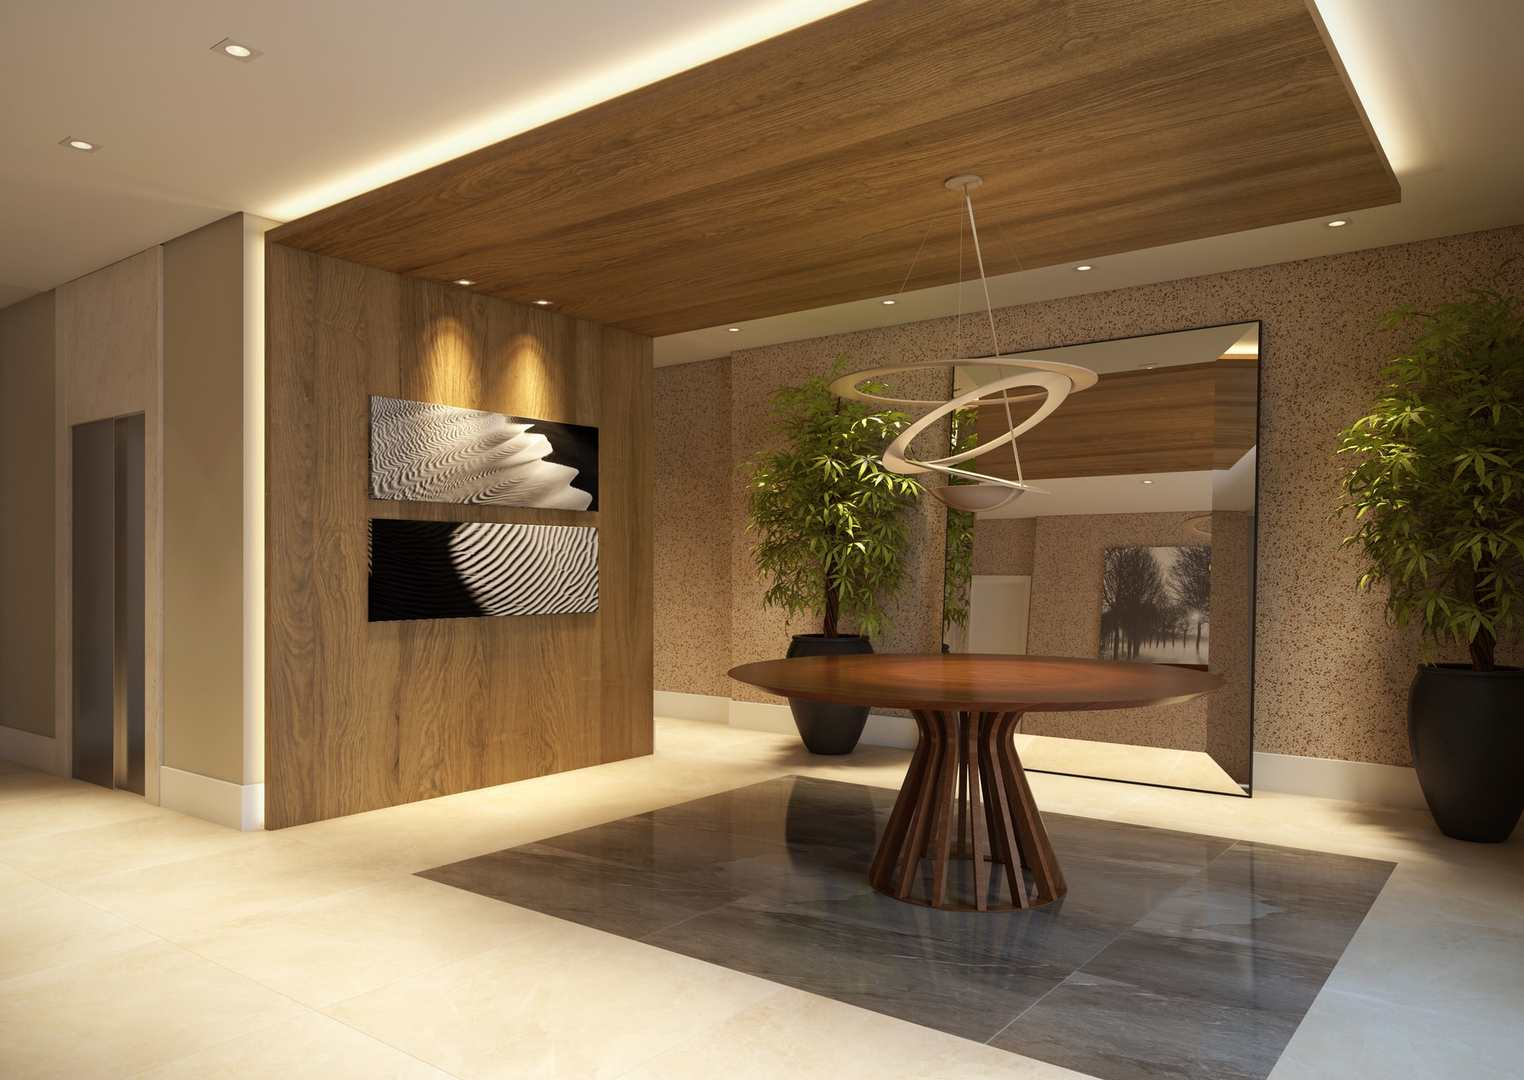 18-lobby-uber-miro-apartamento-ribeirao-preto